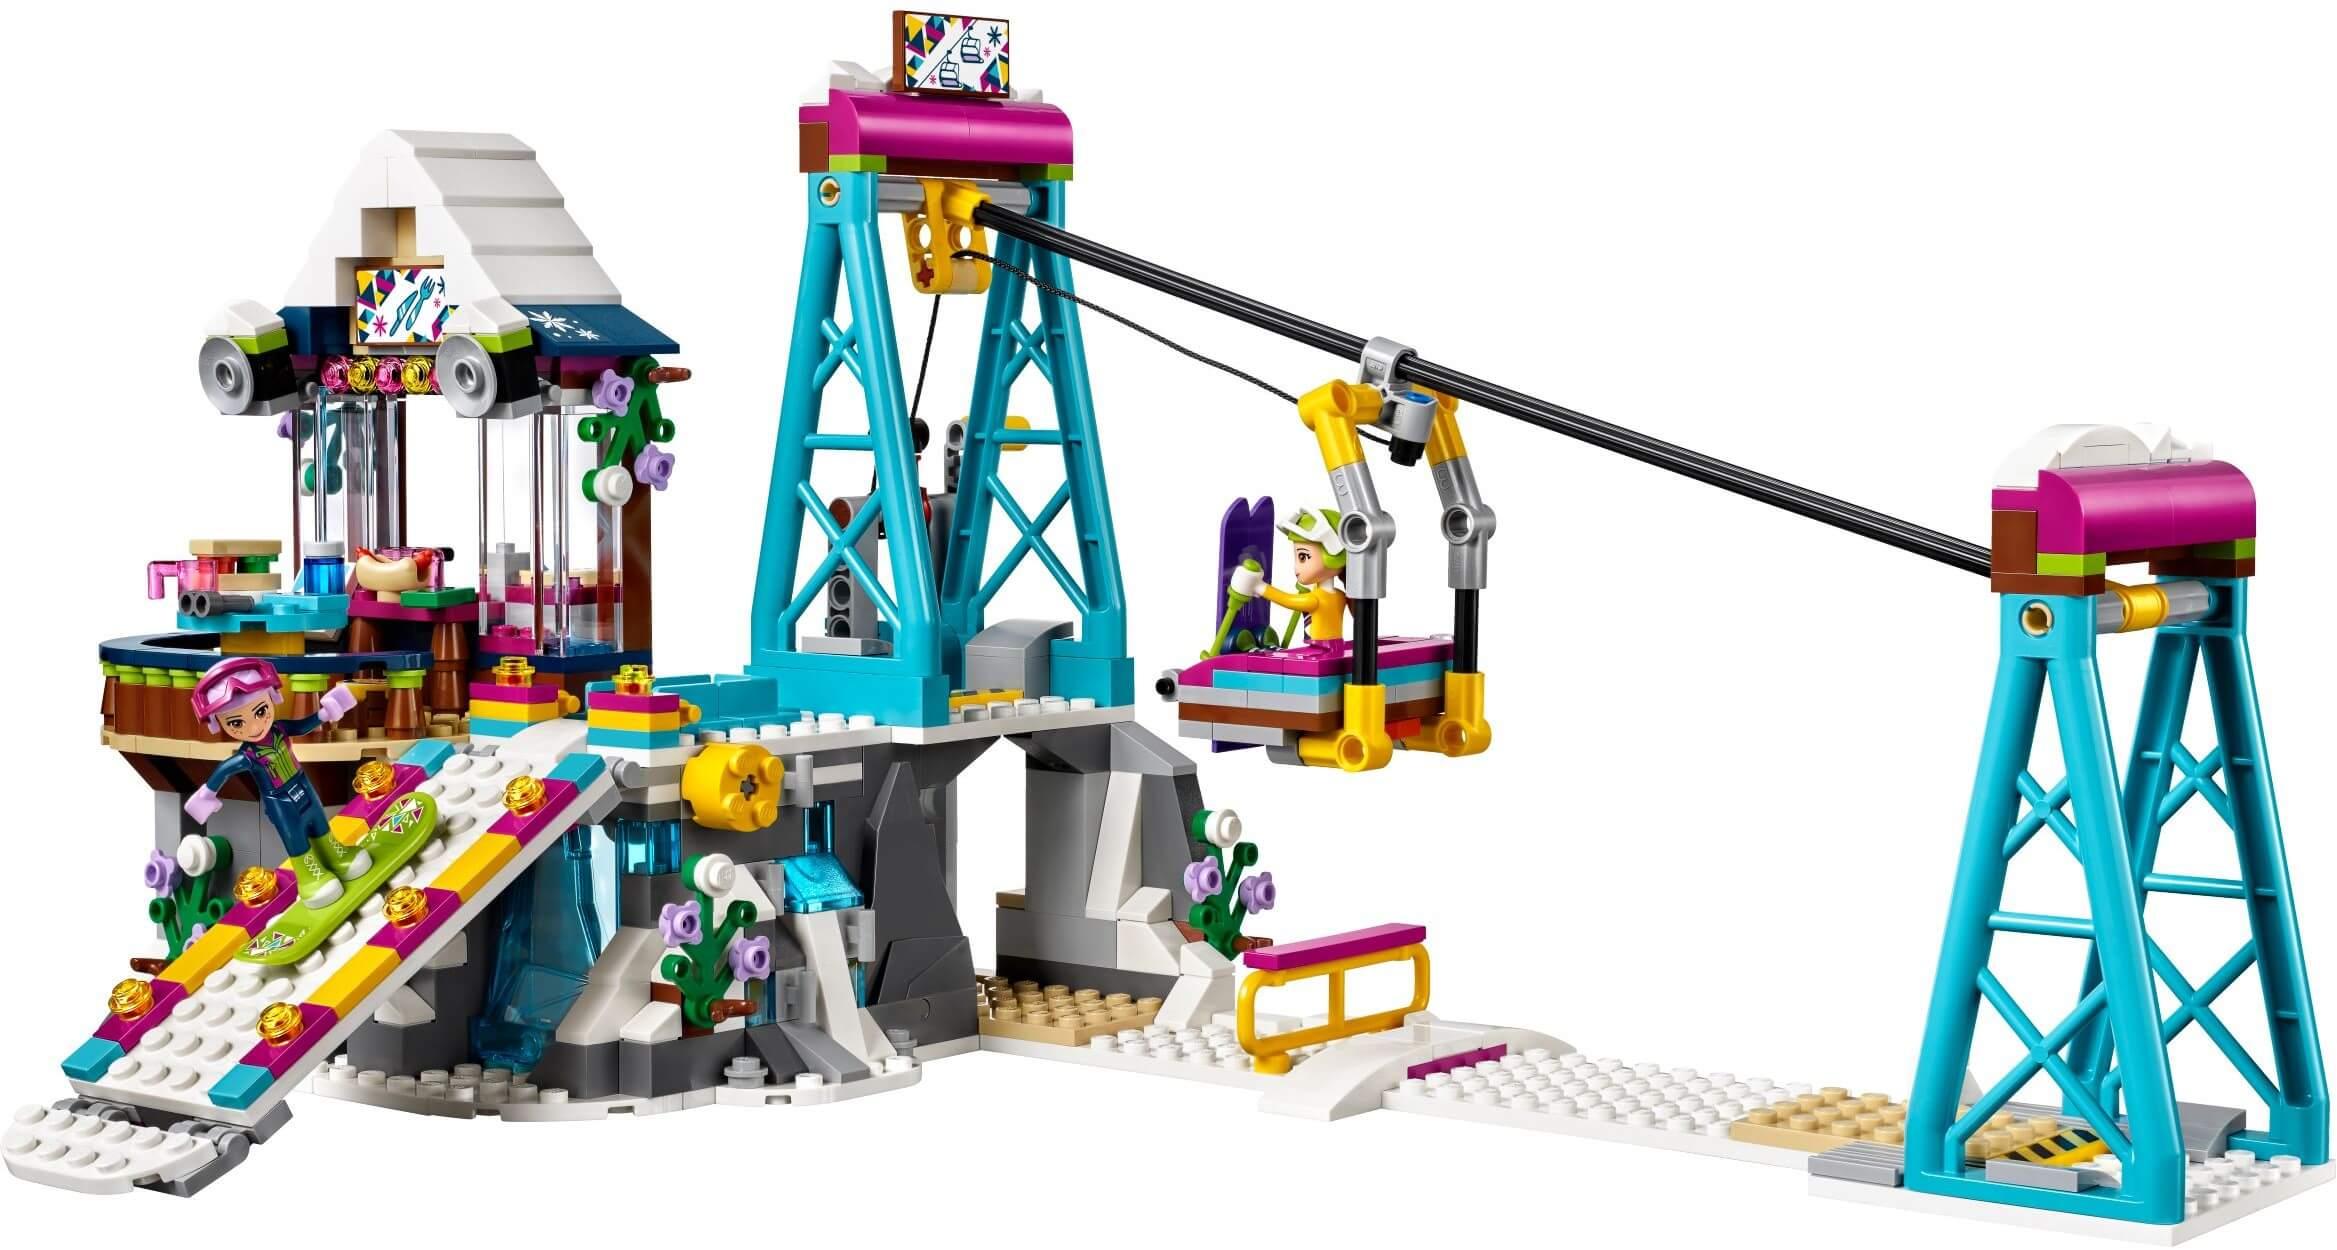 Mua đồ chơi LEGO 41324 - LEGO Friends 41324 - Cáp Treo Băng Tuyết (LEGO Friends Snow Resort Ski Lift)